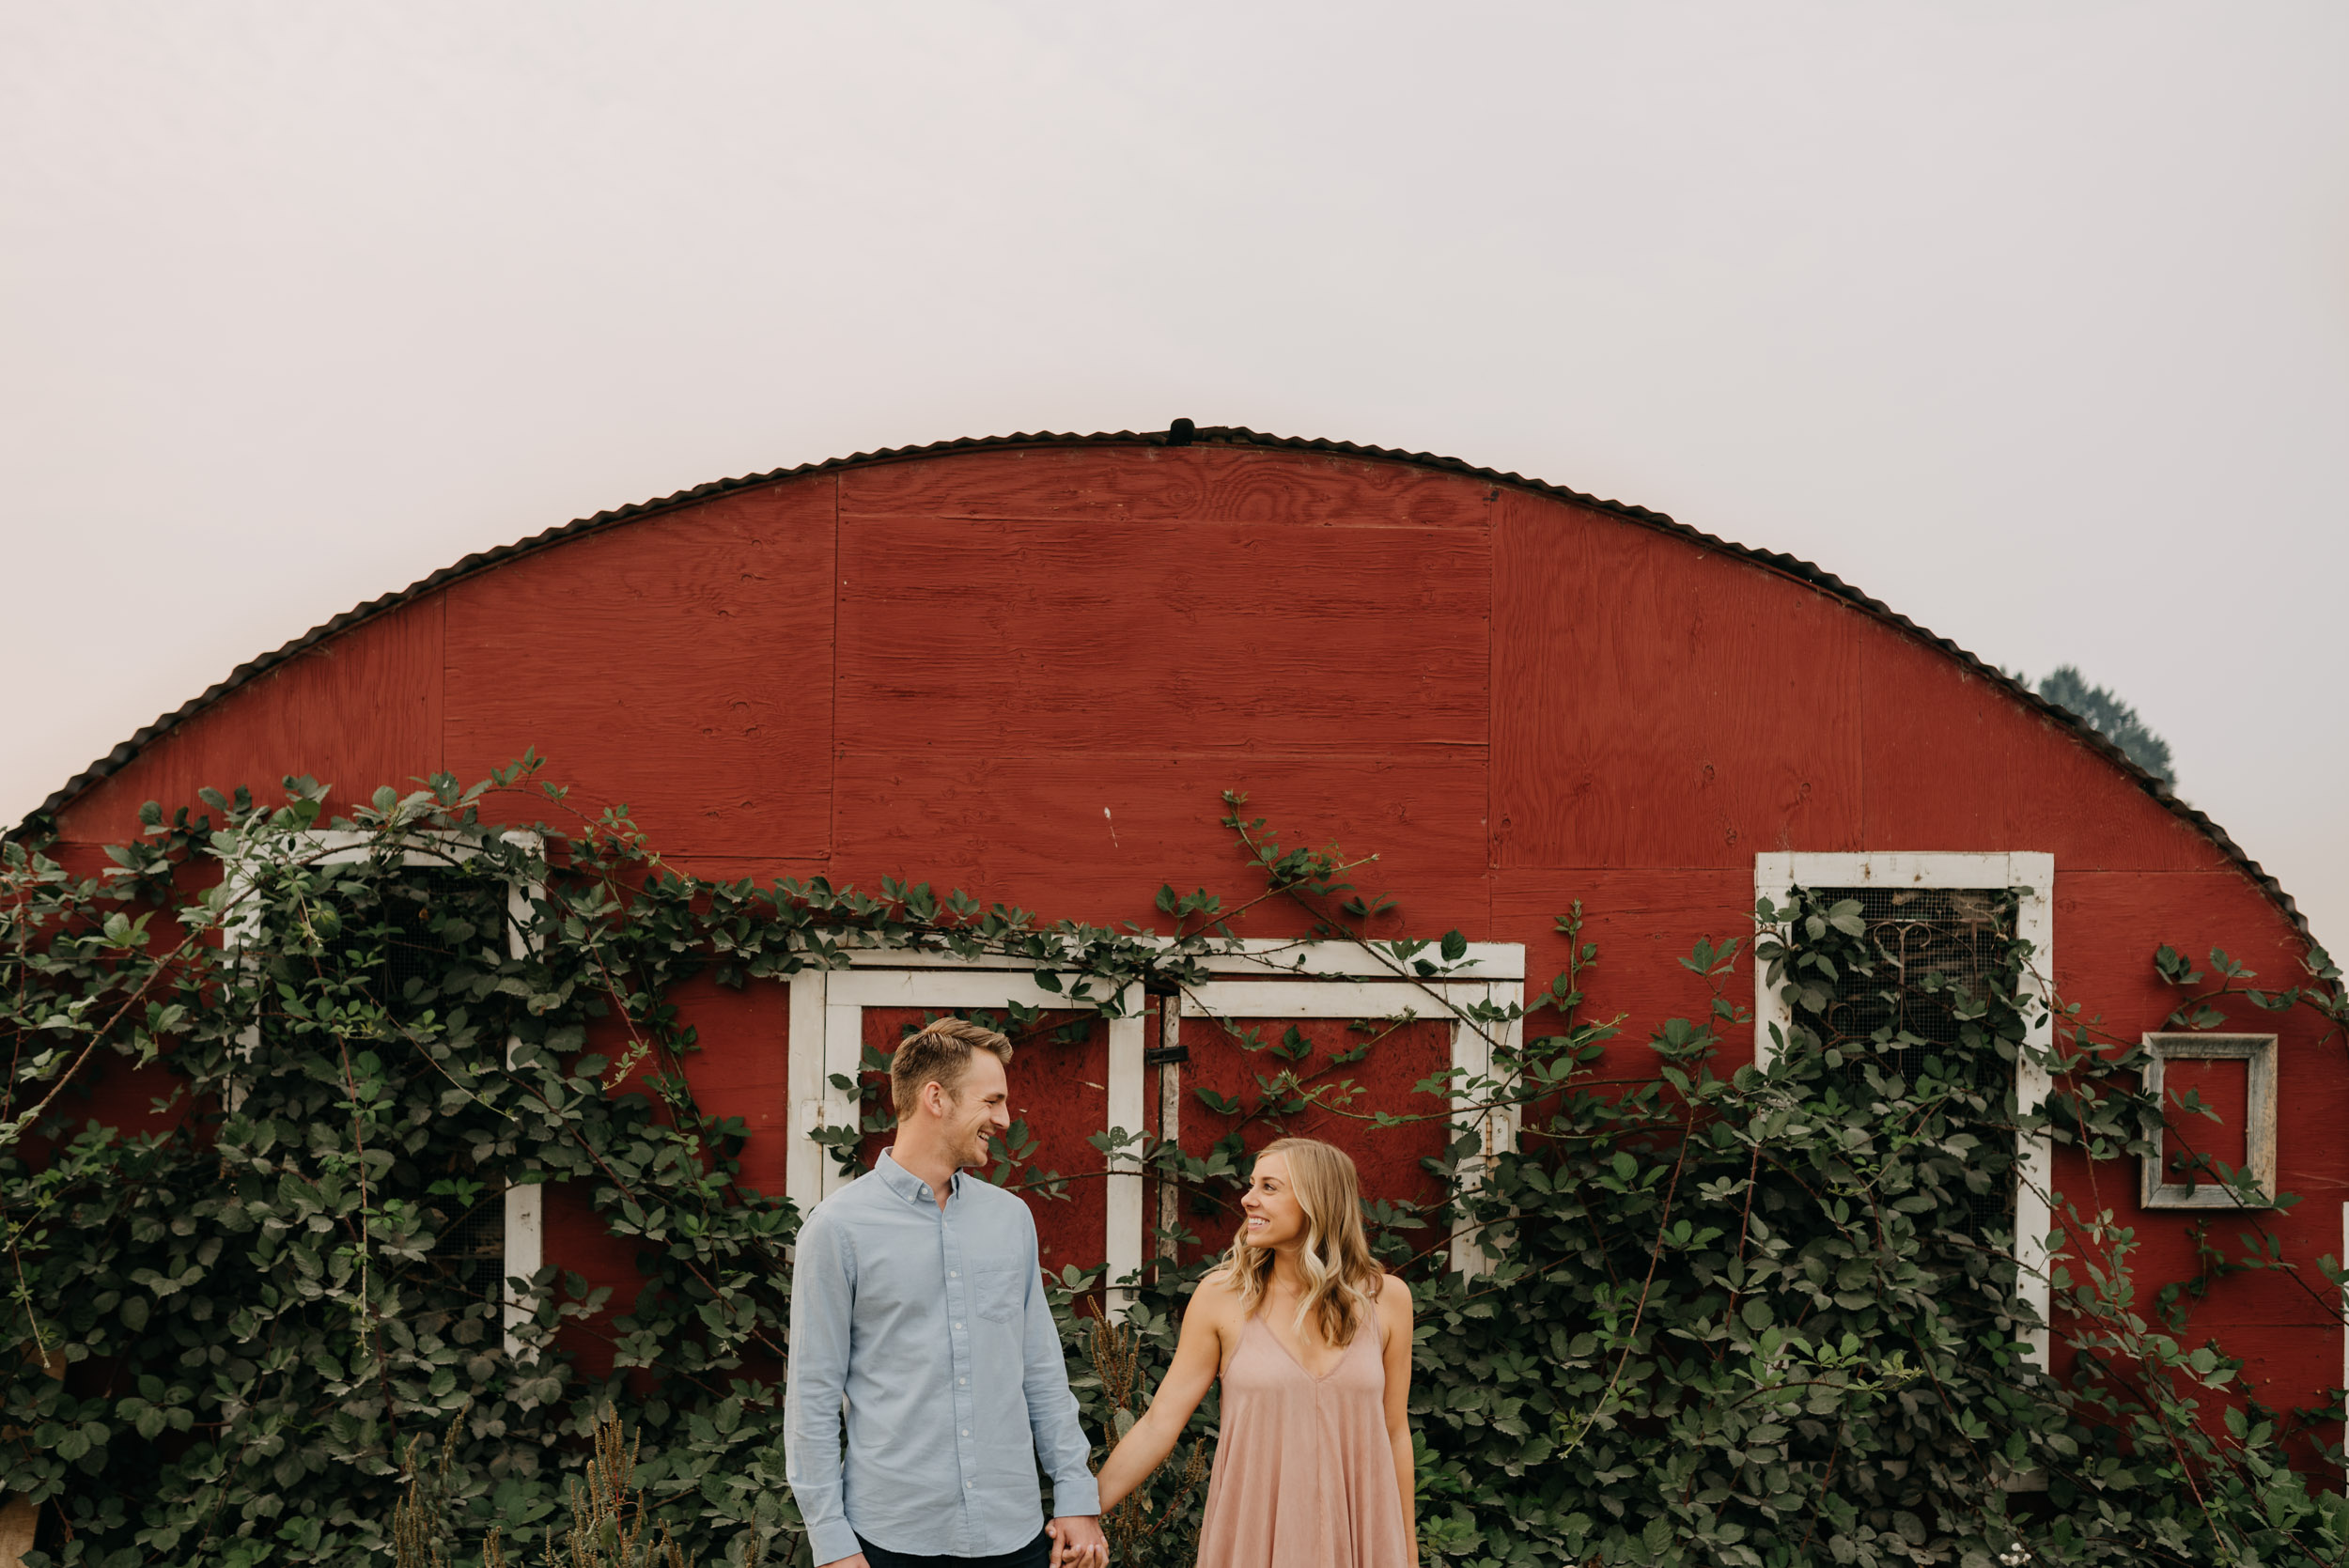 Oregon-Red-Barn-Door-Engagement-Sauvie-3393.jpg